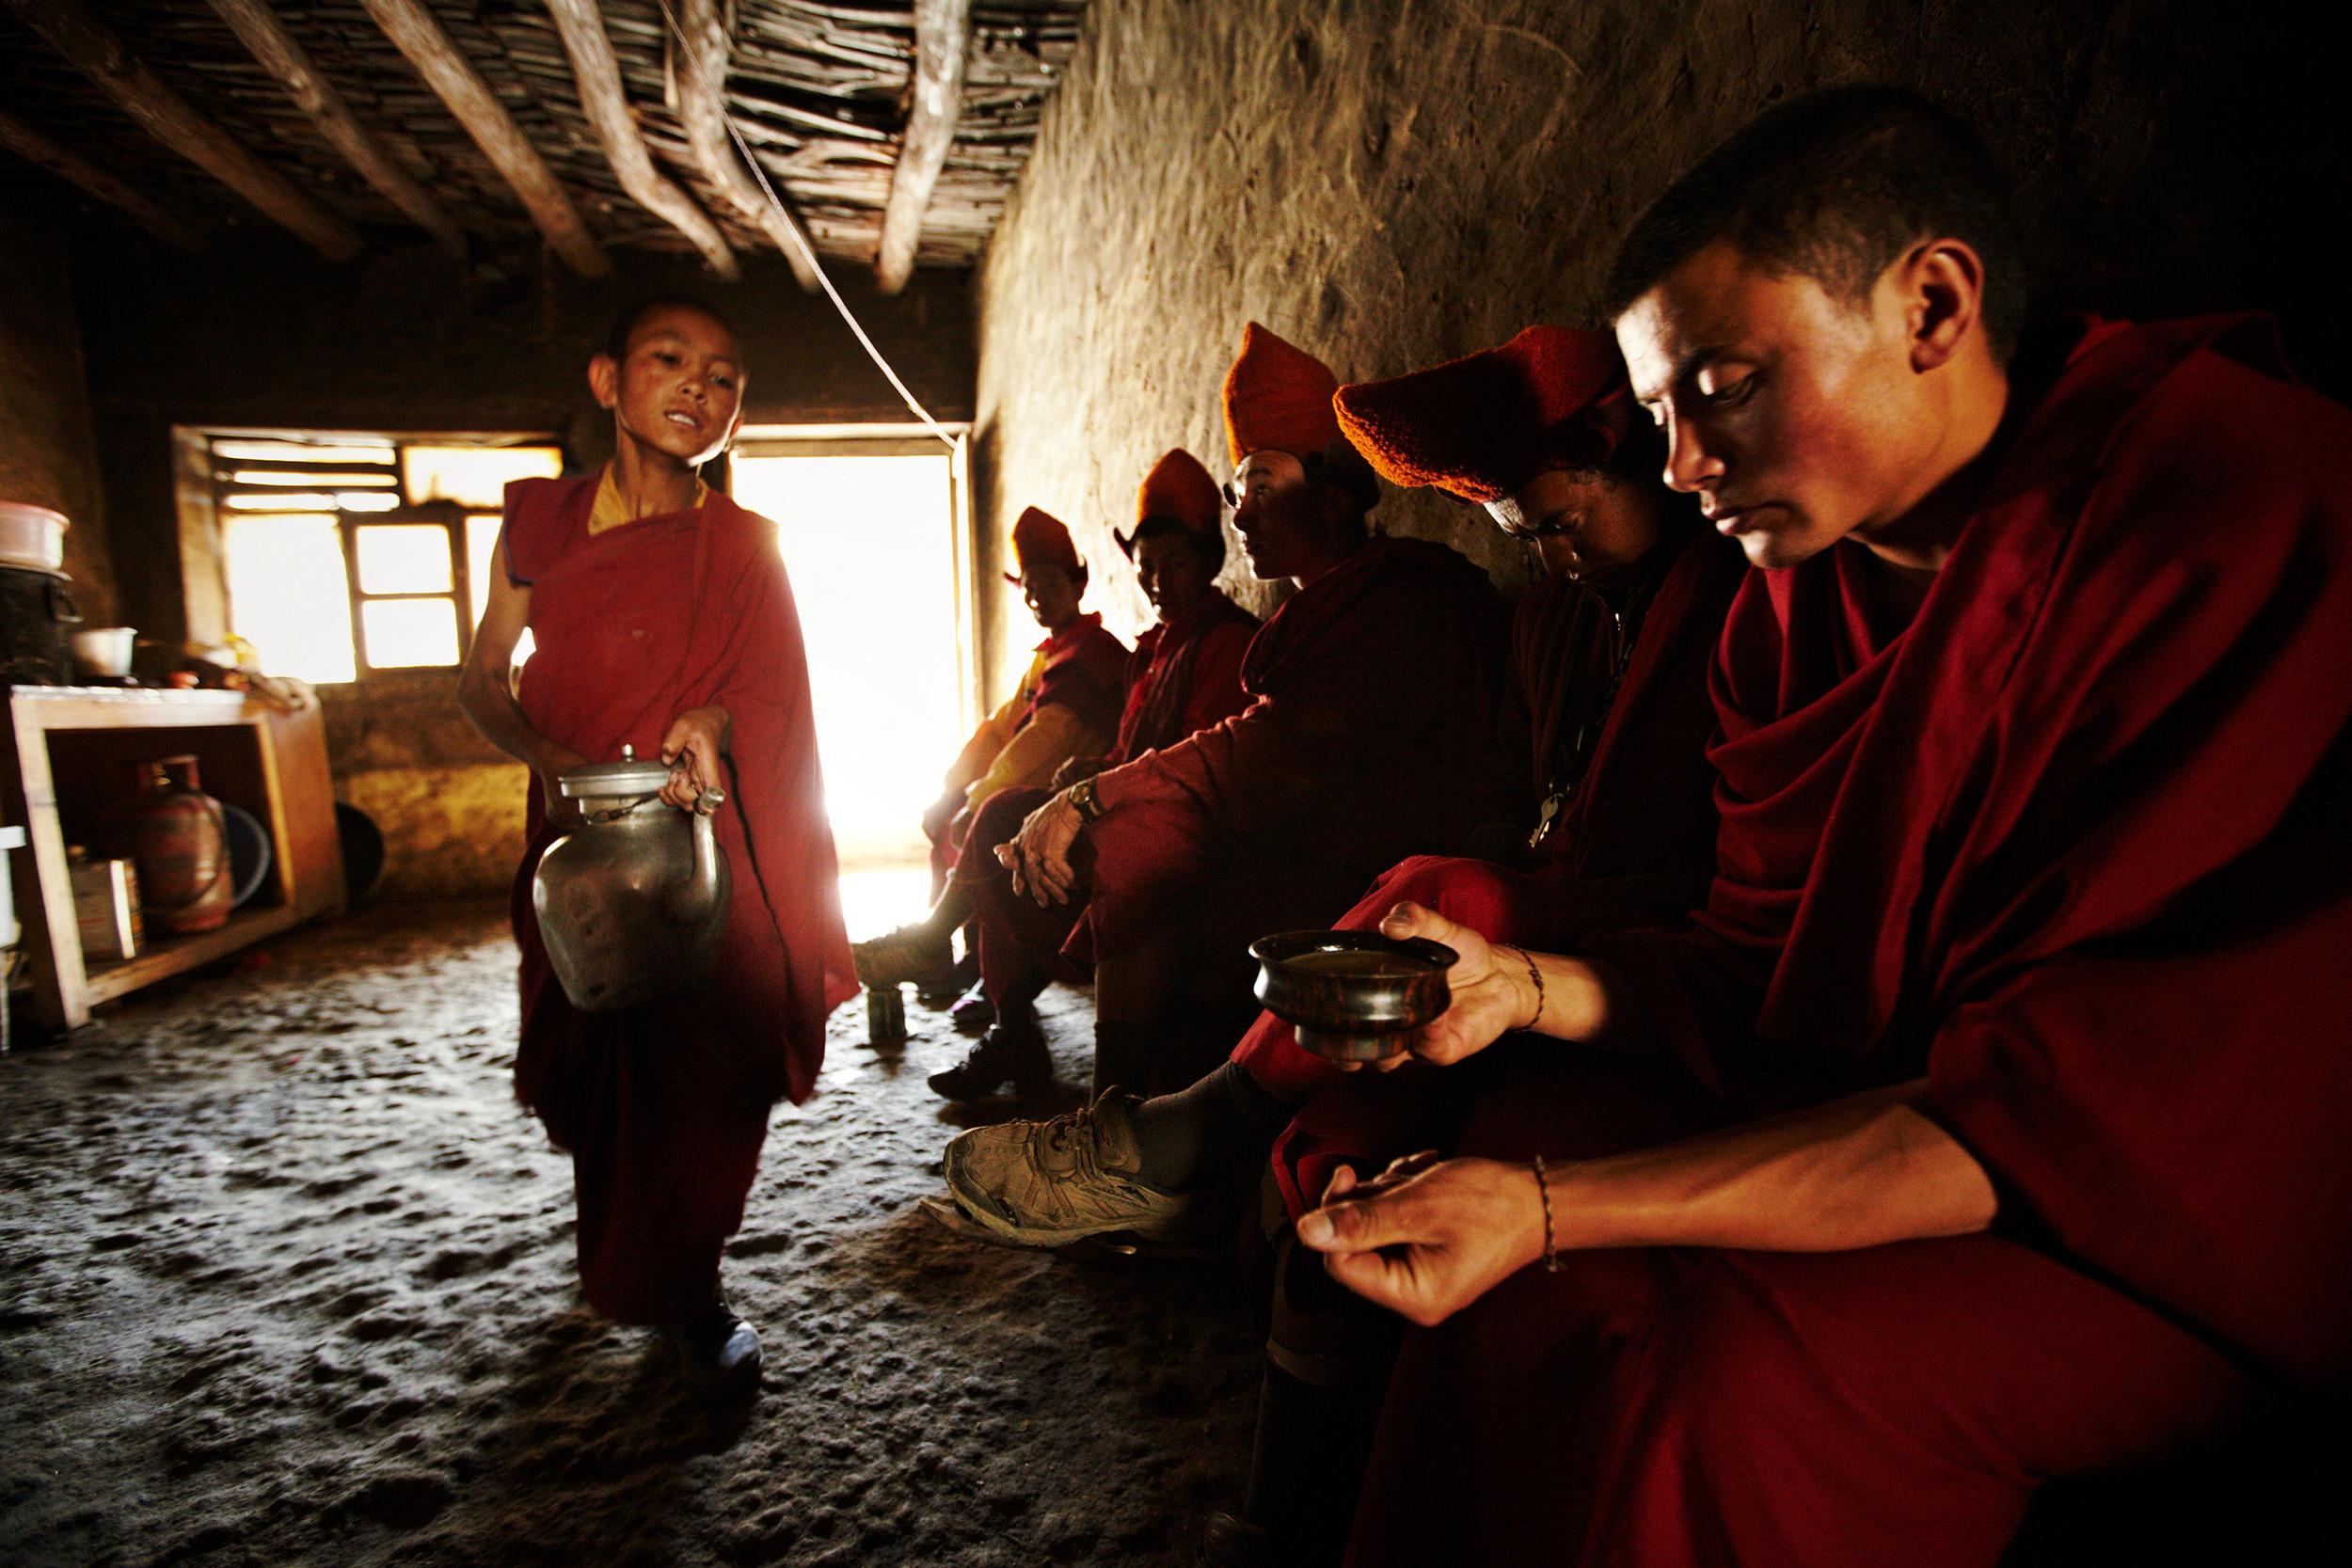 Monks having tea in a monastery kitchen